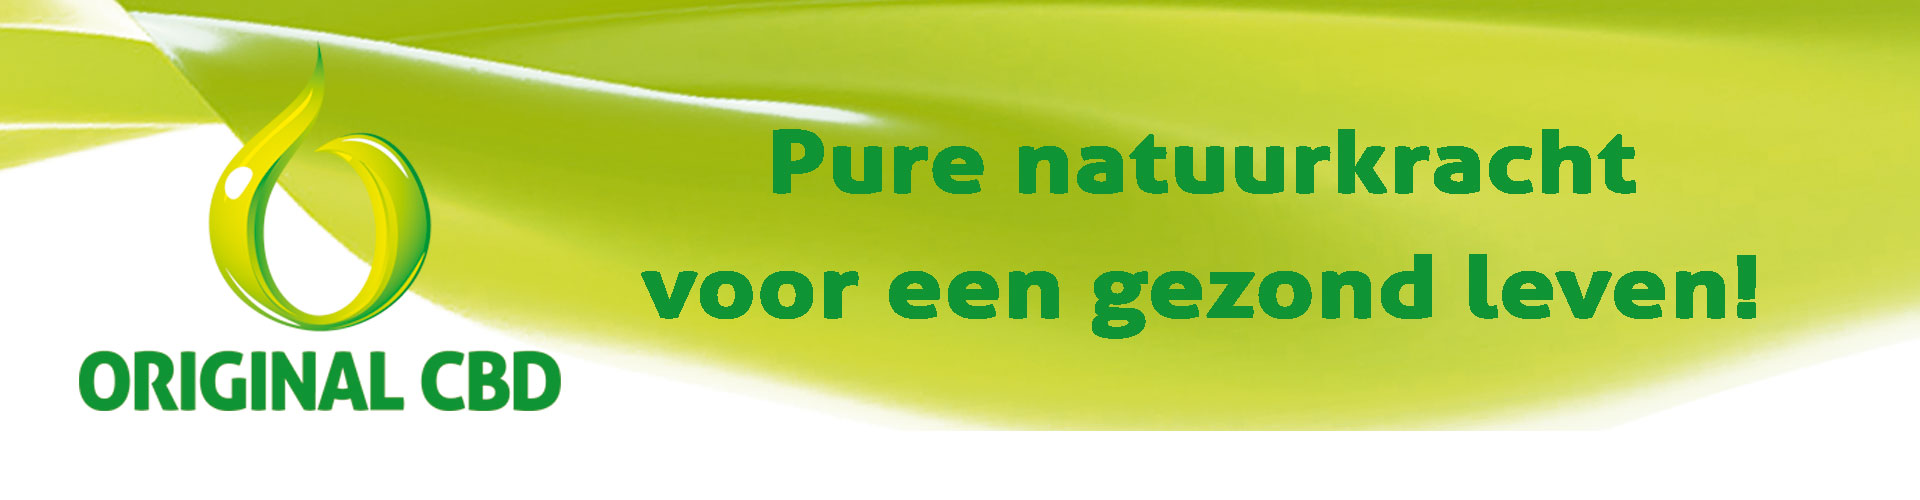 originalcbd.nl | Logo van original cbd